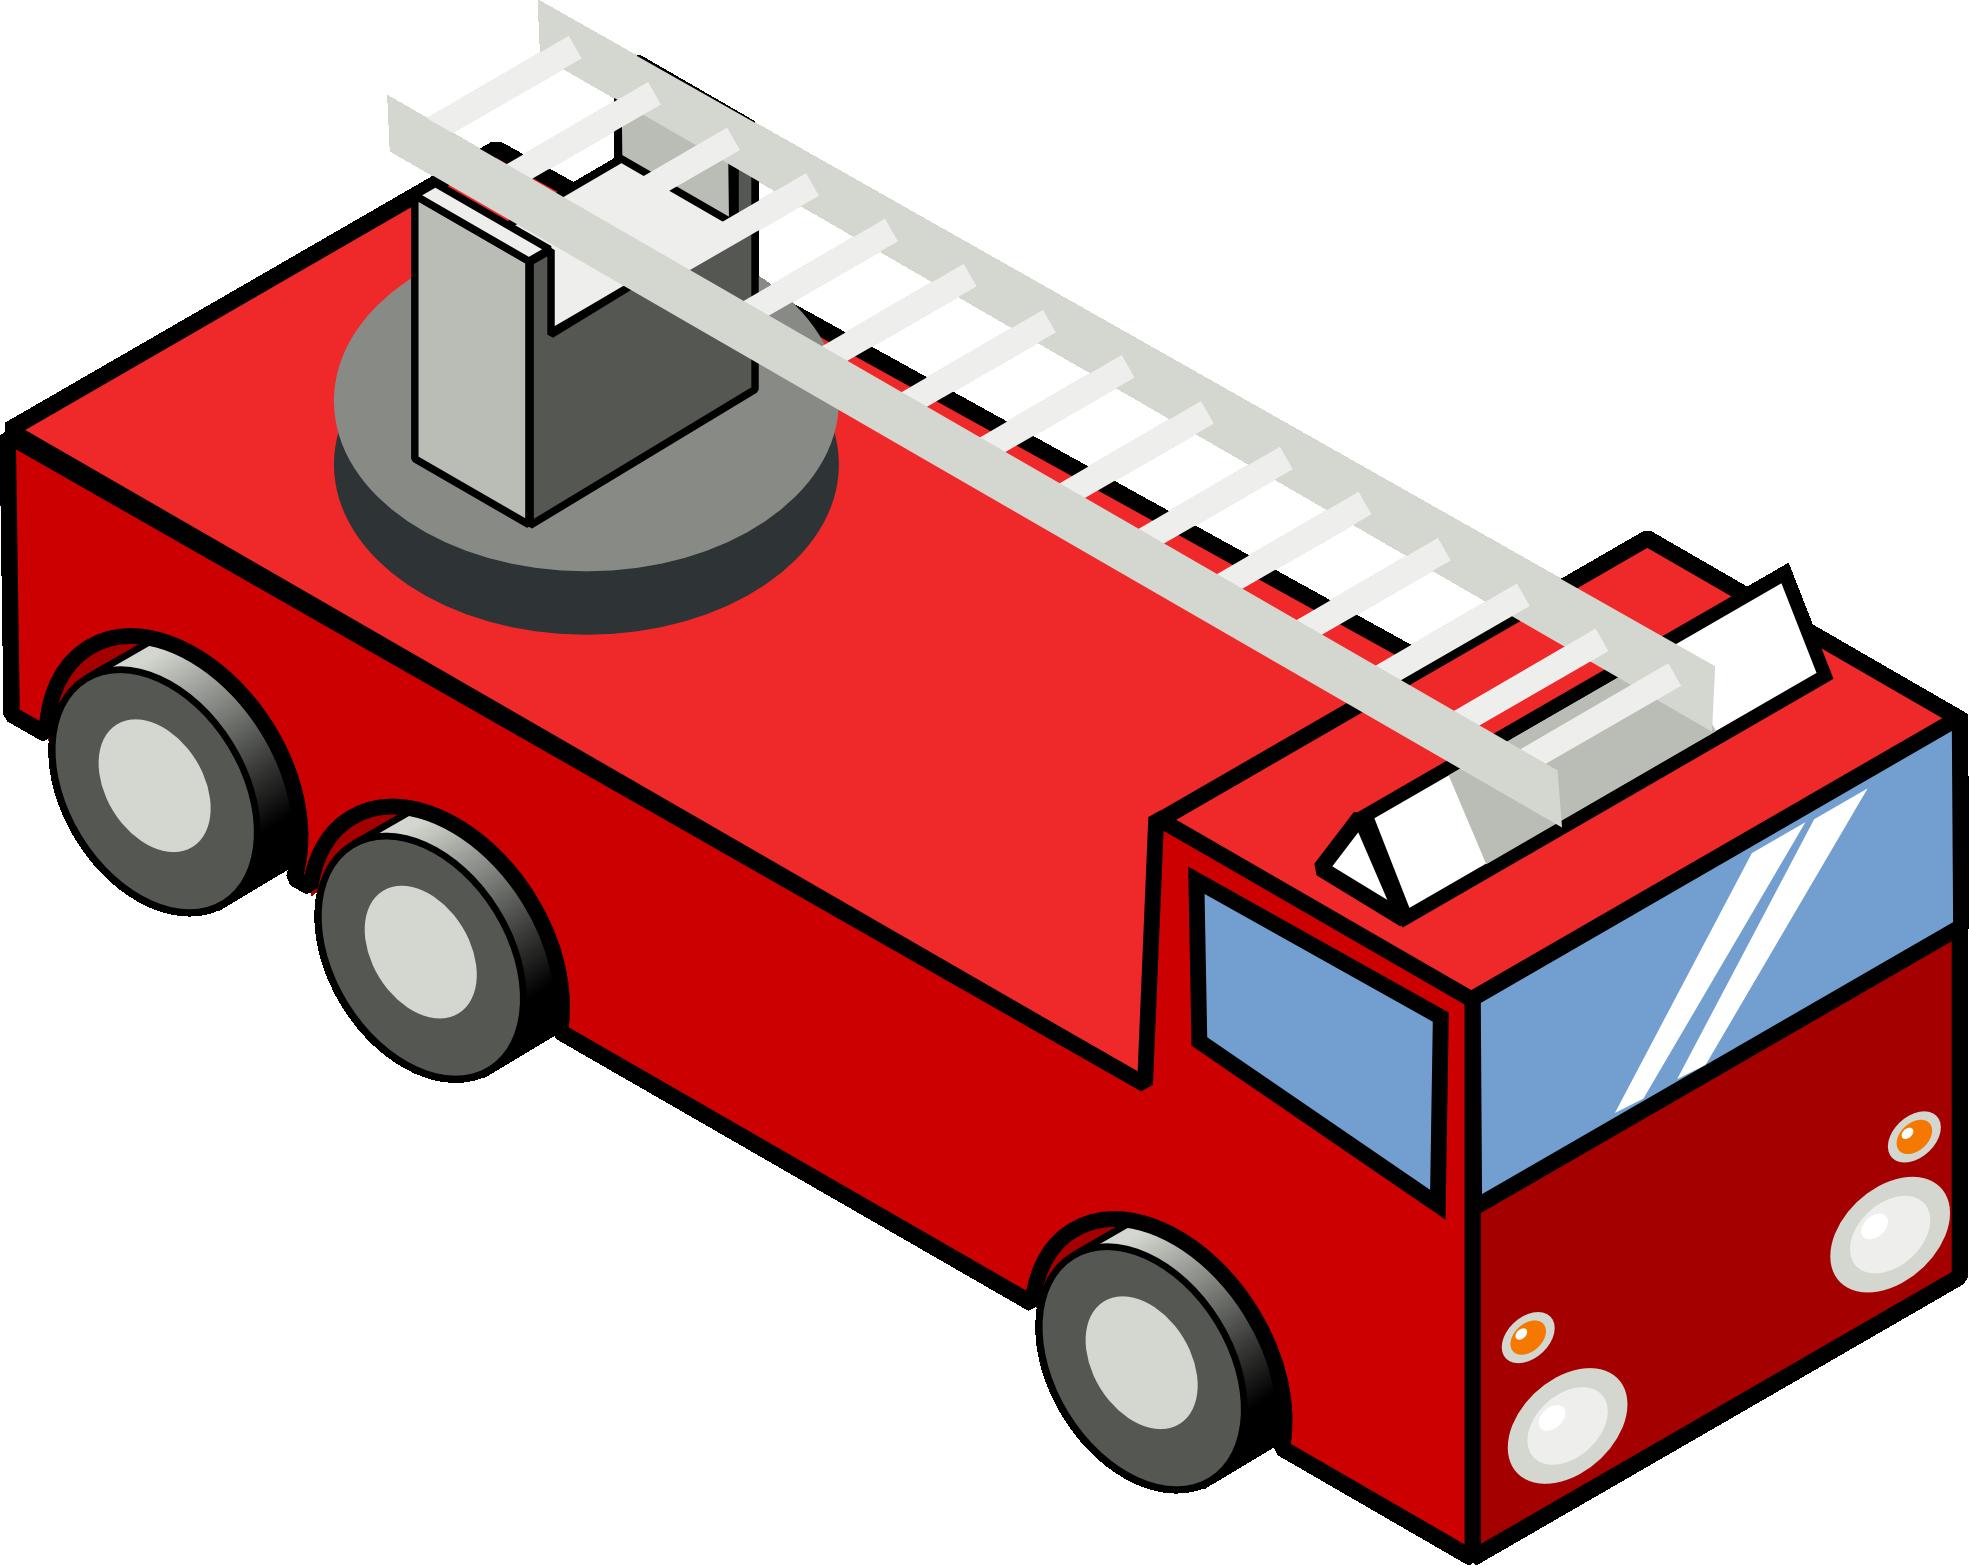 Truck toy pencil and. Firetruck clipart van fire